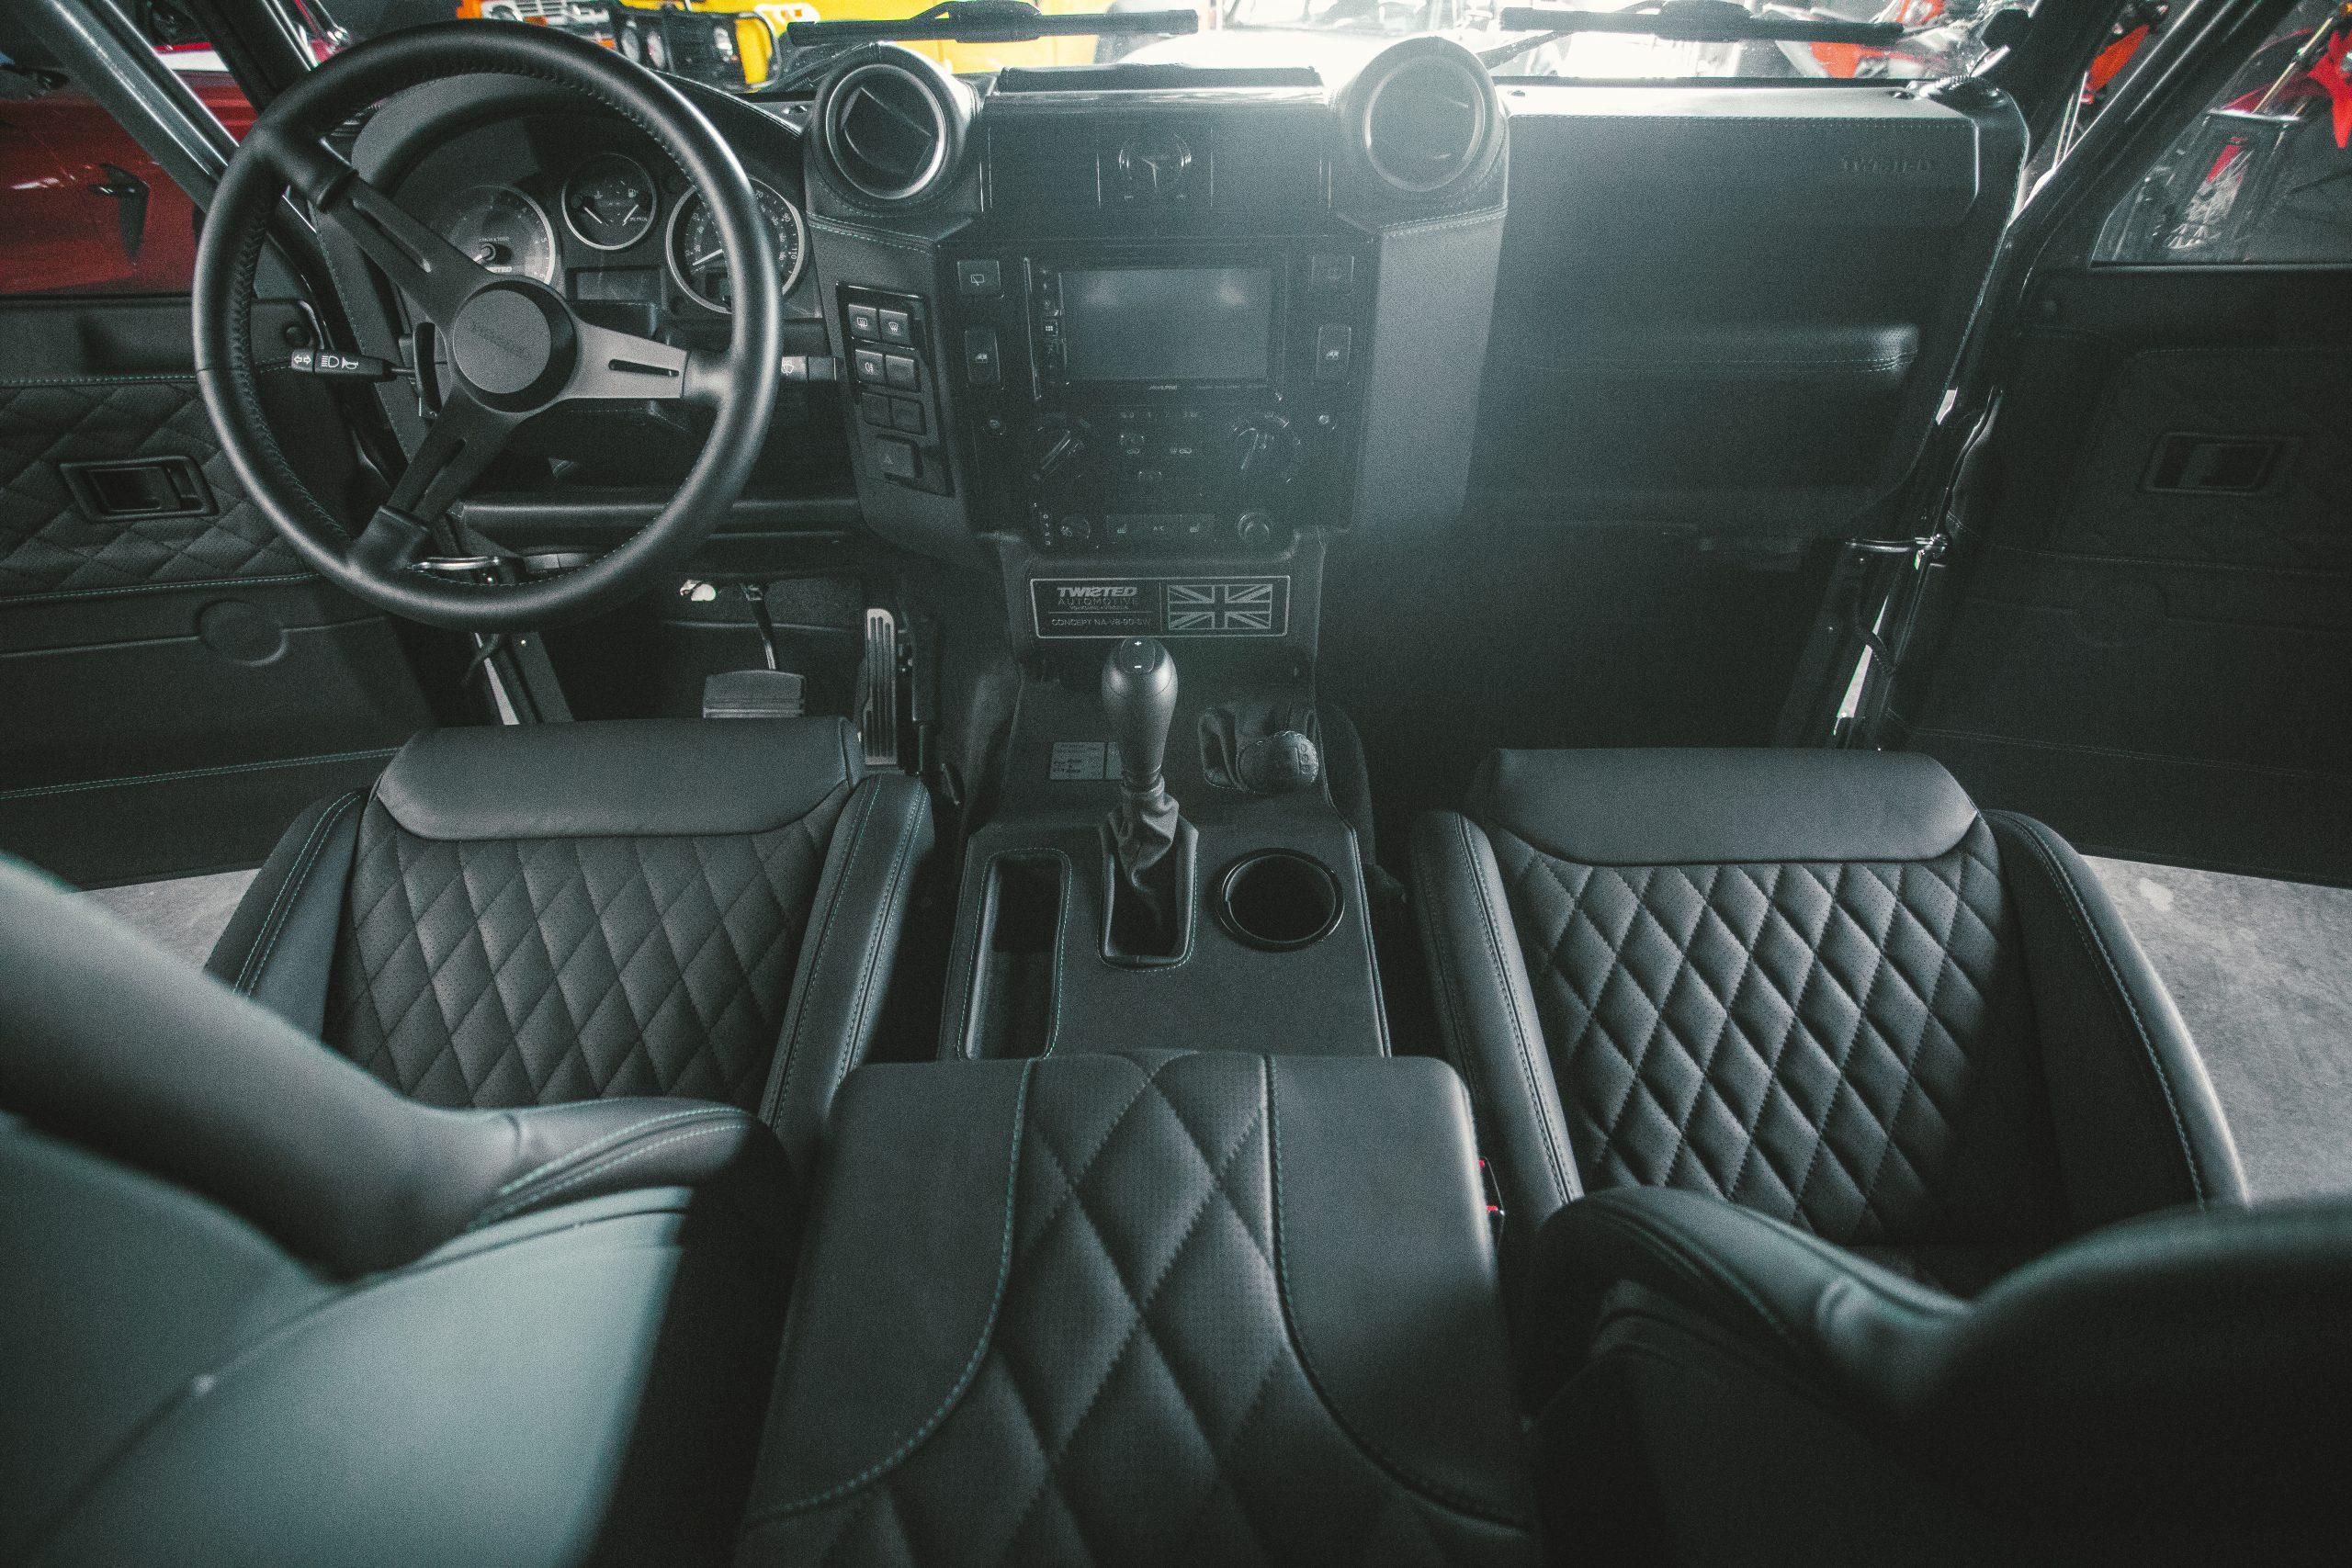 Twisted interior